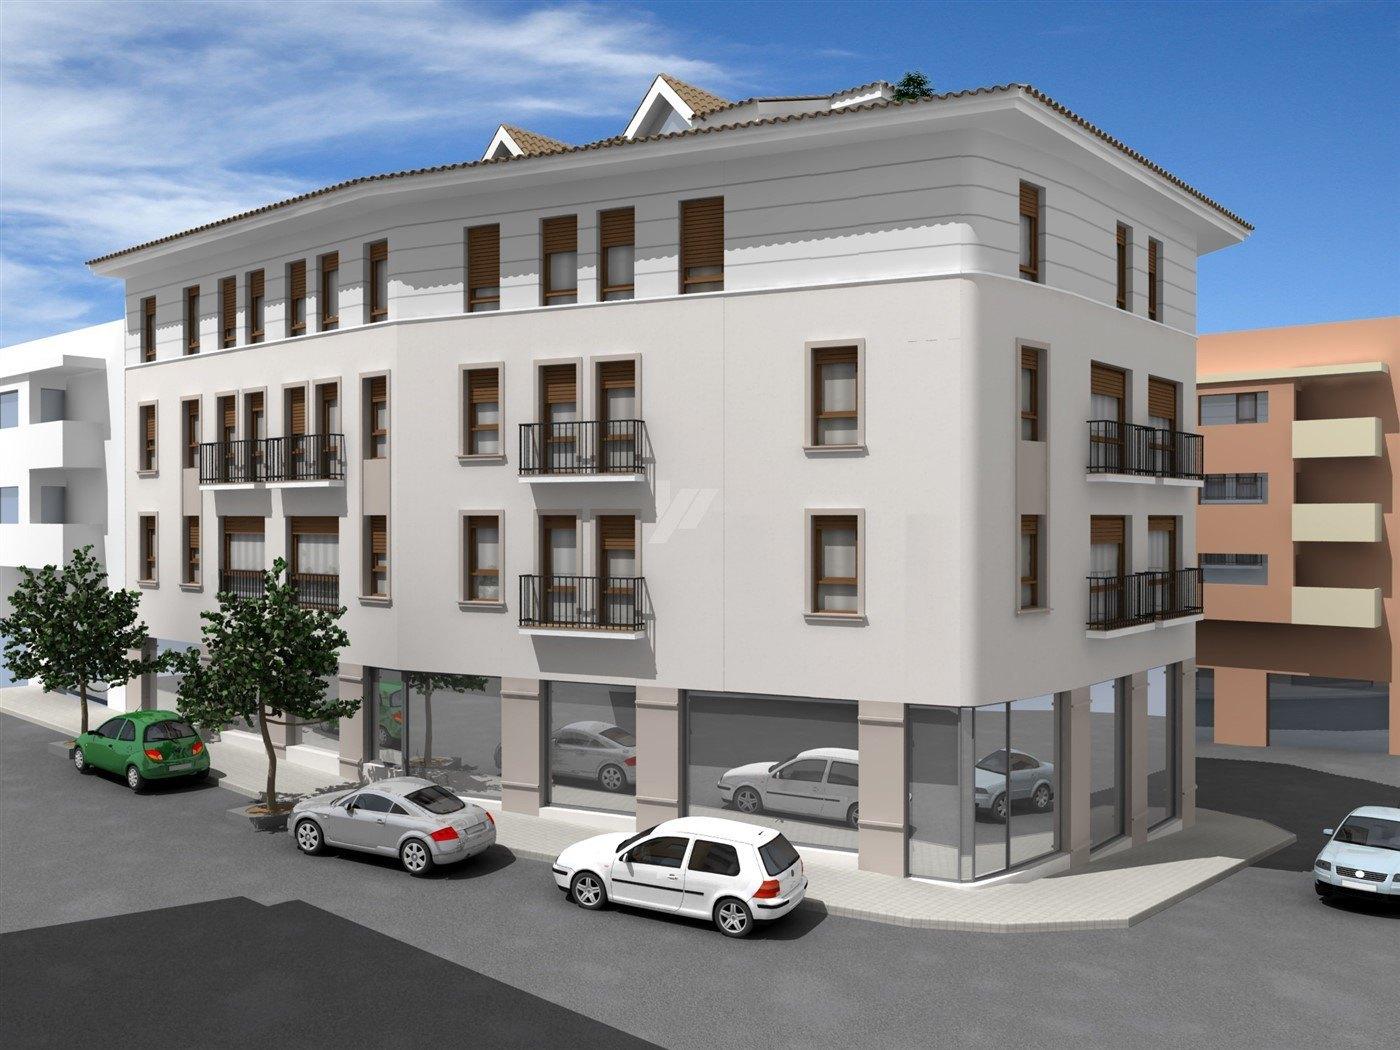 New build apartment for sale in Moraira, Costa Blanca.